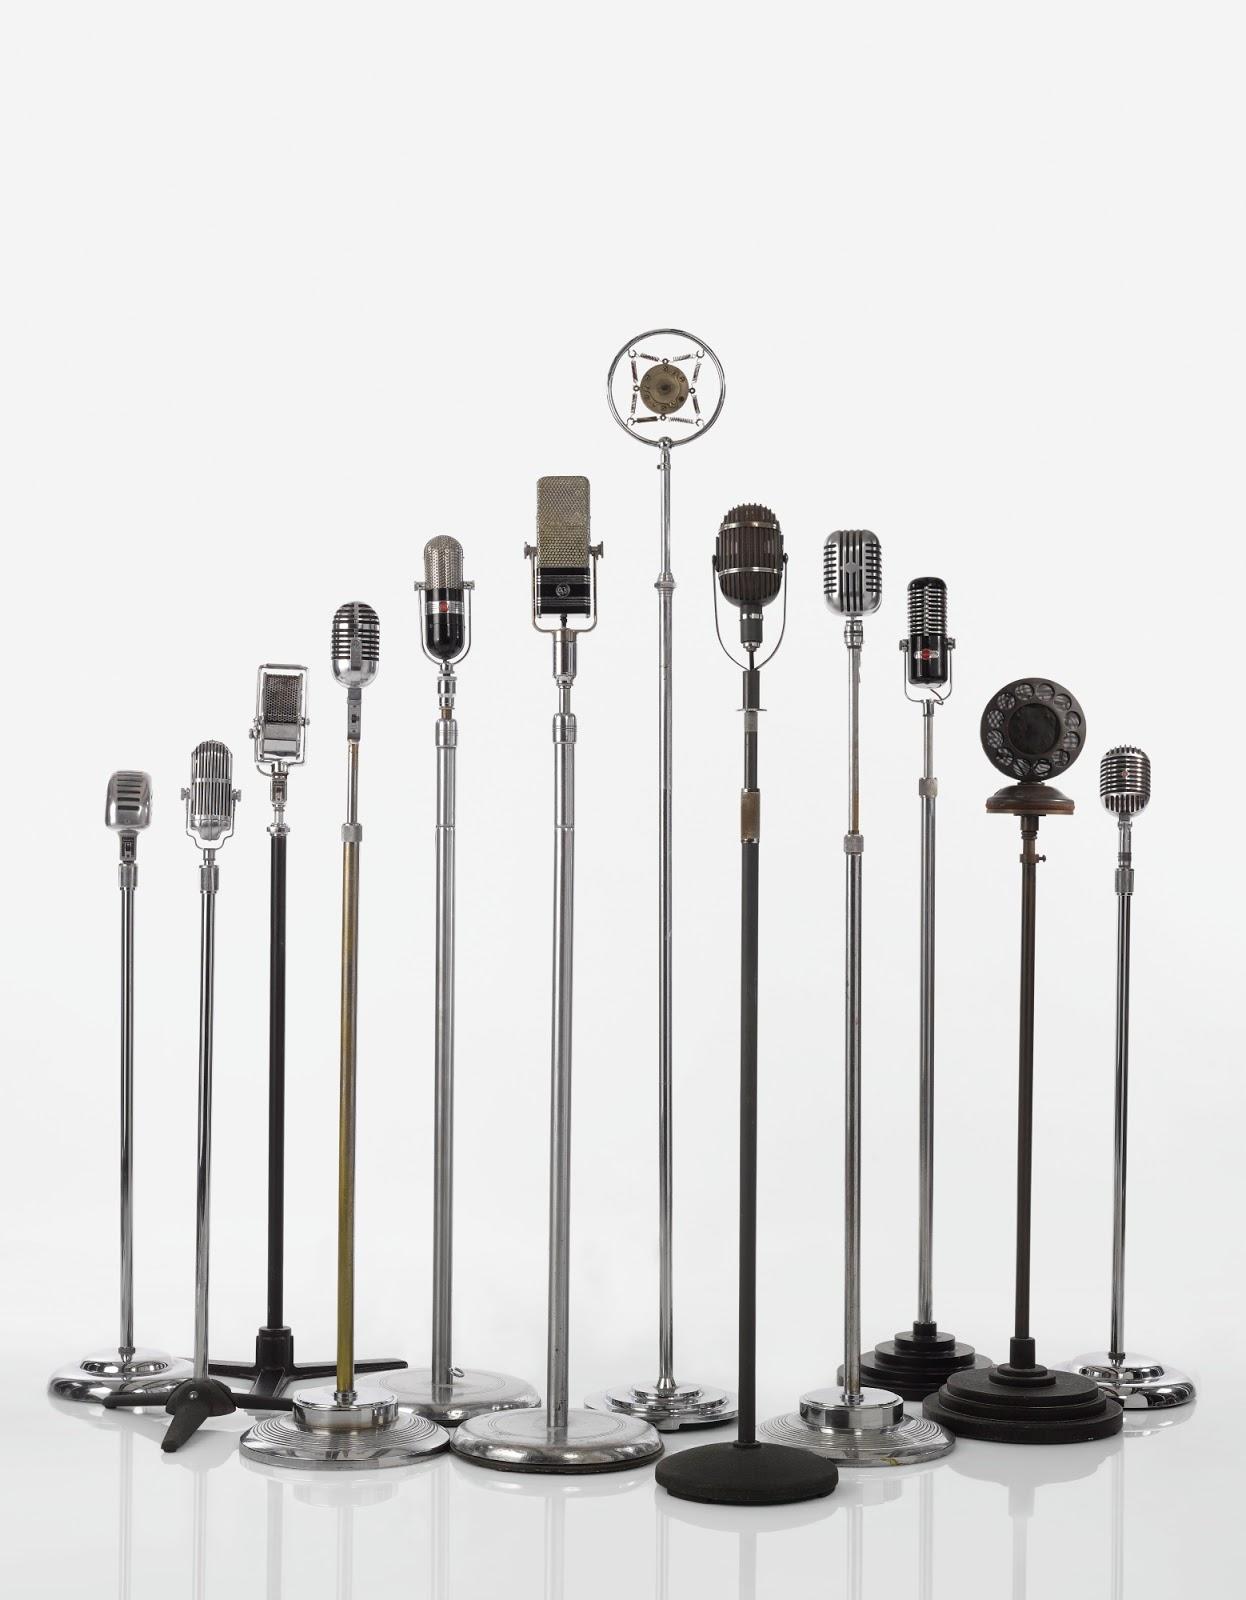 46f20b5b009c7 American Modernist Microphones, 1930s-1940s | BlueisKewl